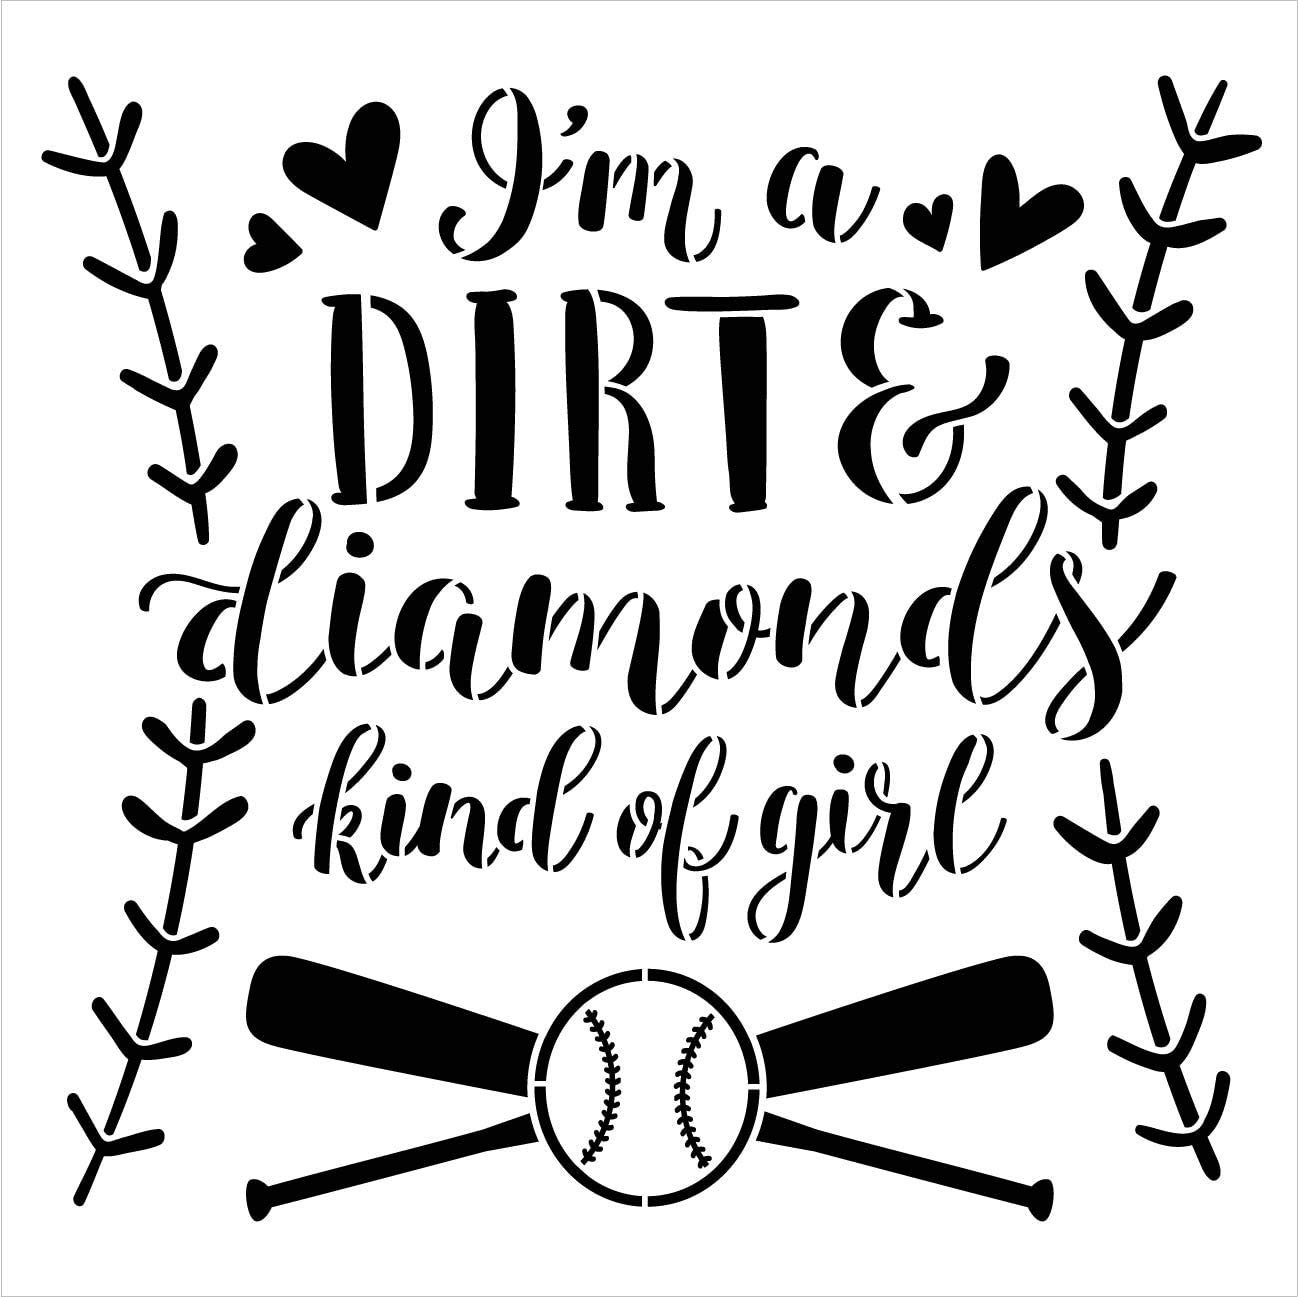 Dirt Diamond Girl Stencil by StudioR12   DIY Softball Baseball Lover Sport Home Decor   Craft & Paint Wood Sign Reusable Mylar Template   Bat Heart Stitch Pattern   Select Size